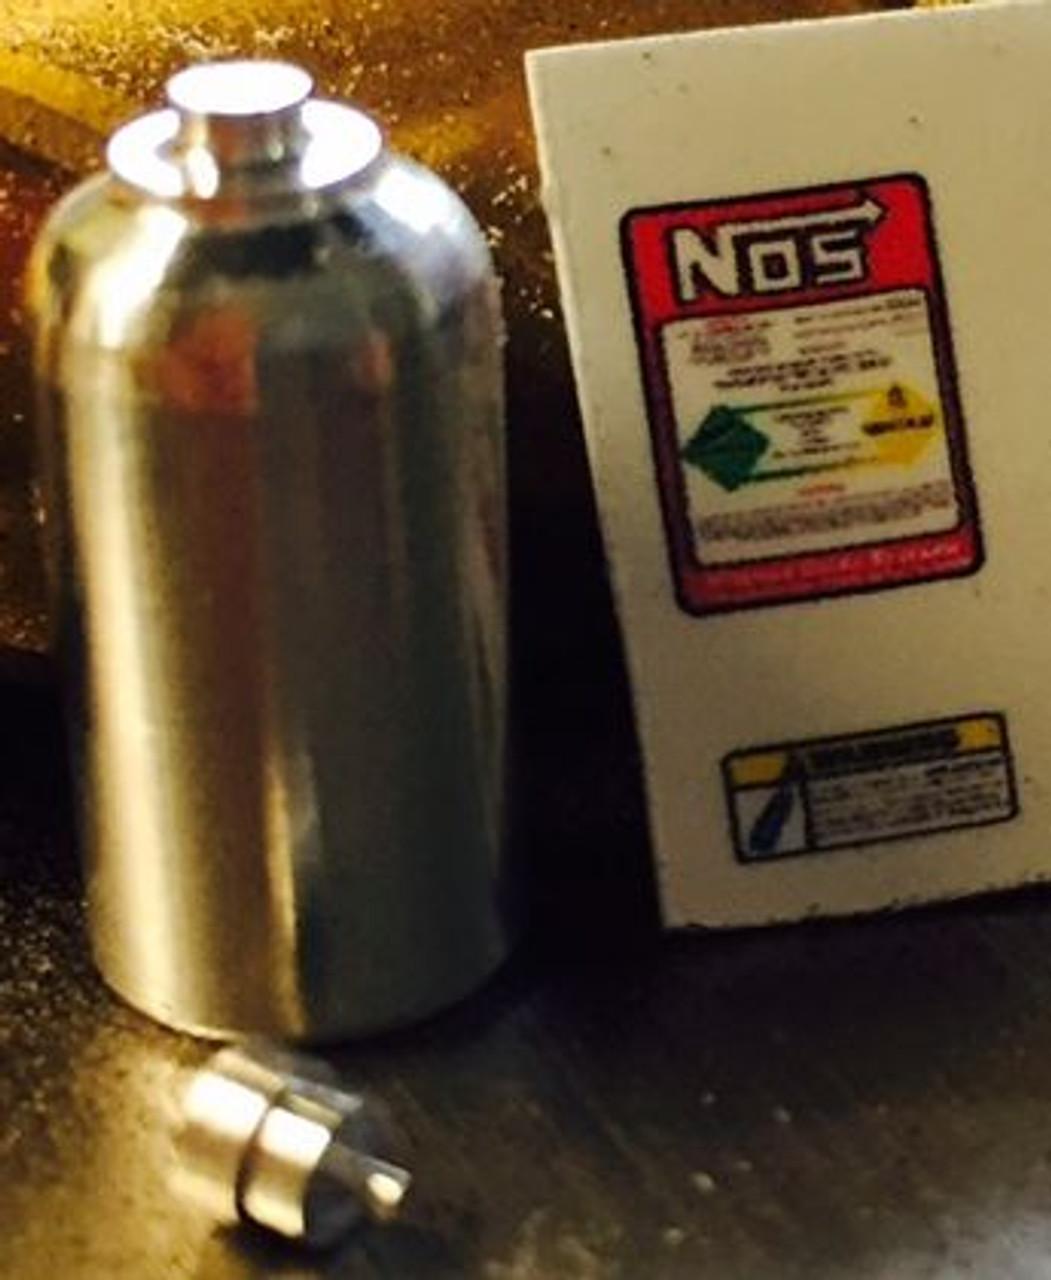 NOS Bottle, Large Aluminum 1/25